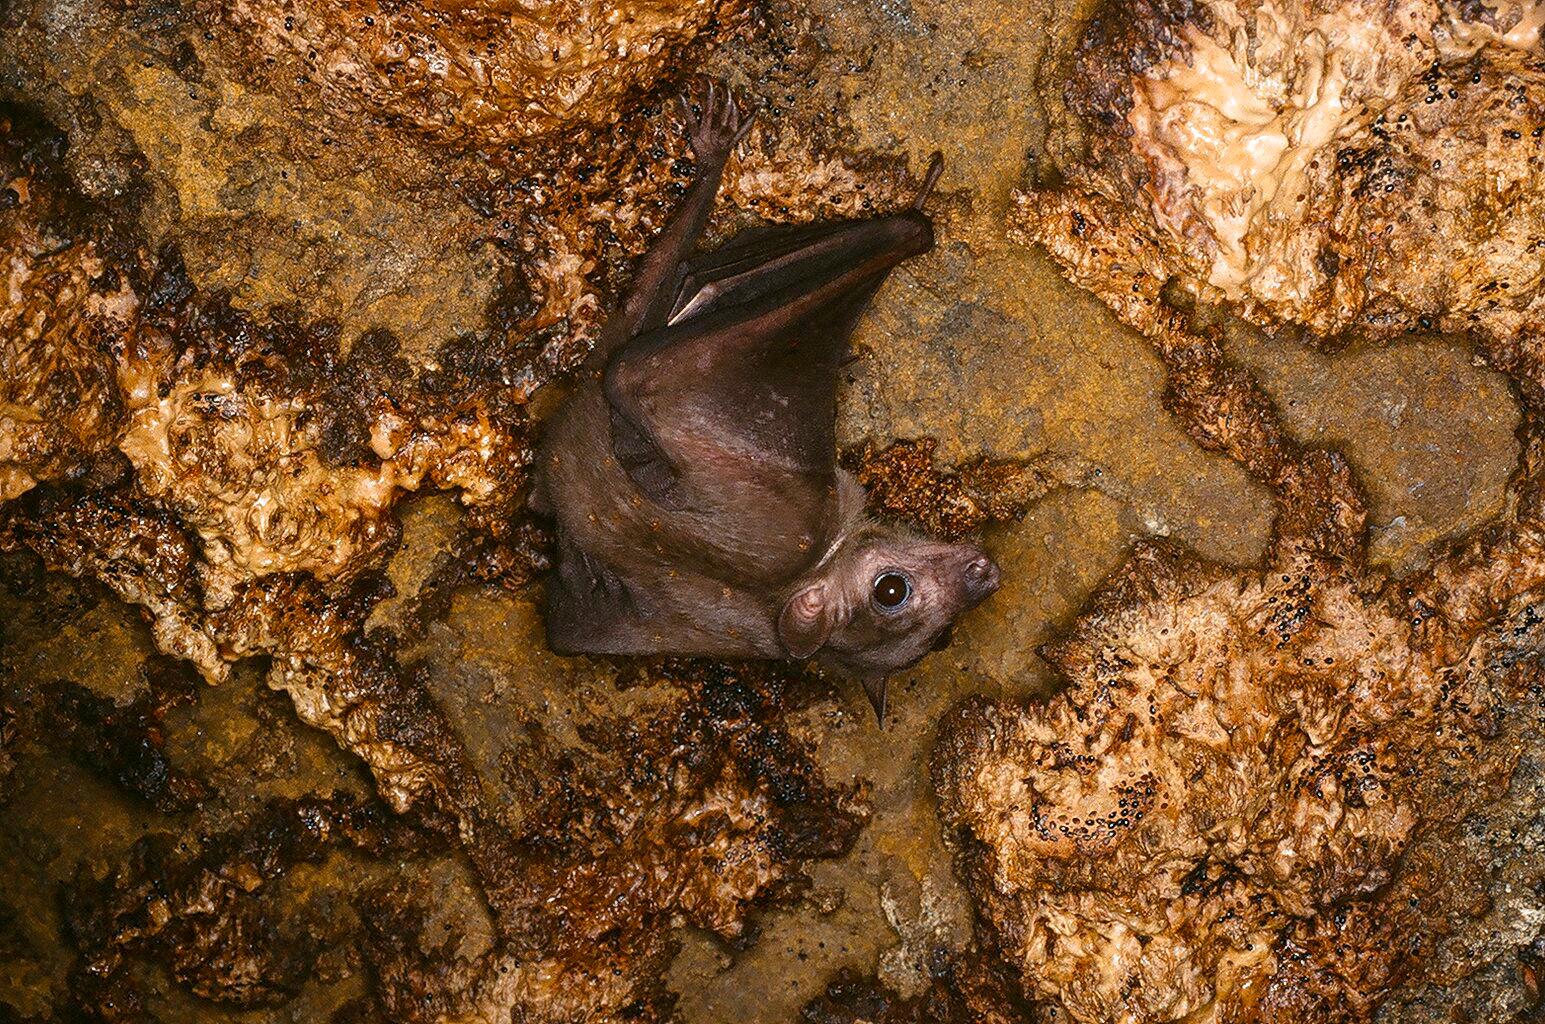 JUVENILE EGYPTIAN FRUIT BAT (Rousettus aegyptiacus)